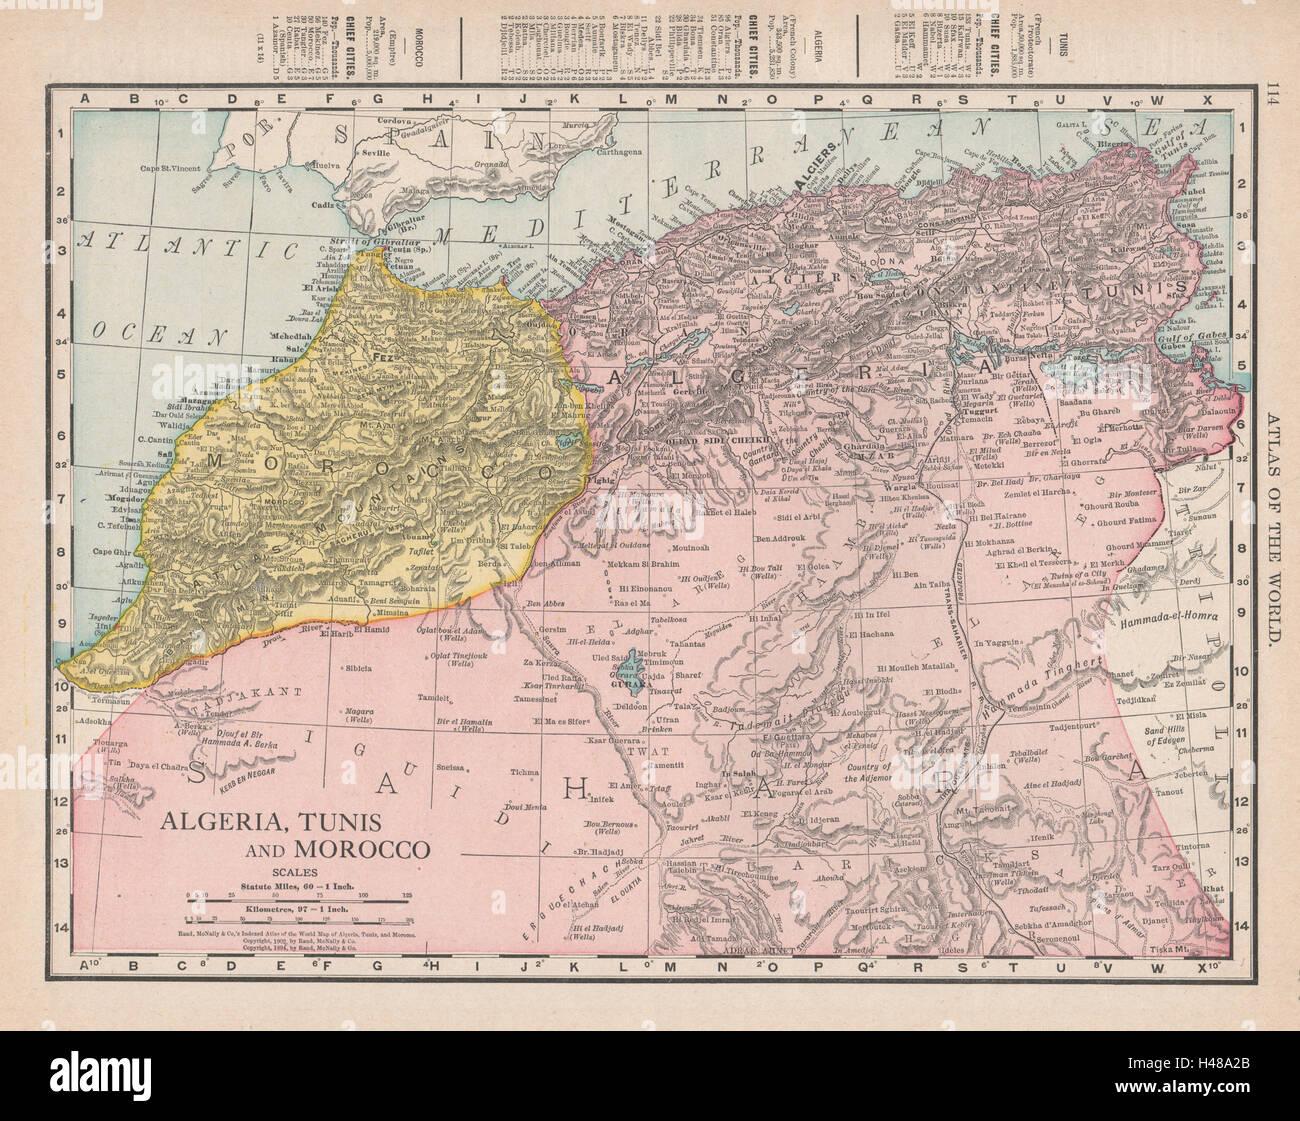 Map Of Africa Sahara Desert.Algeria Tunisia Morocco Sahara Desert North Africa Rand